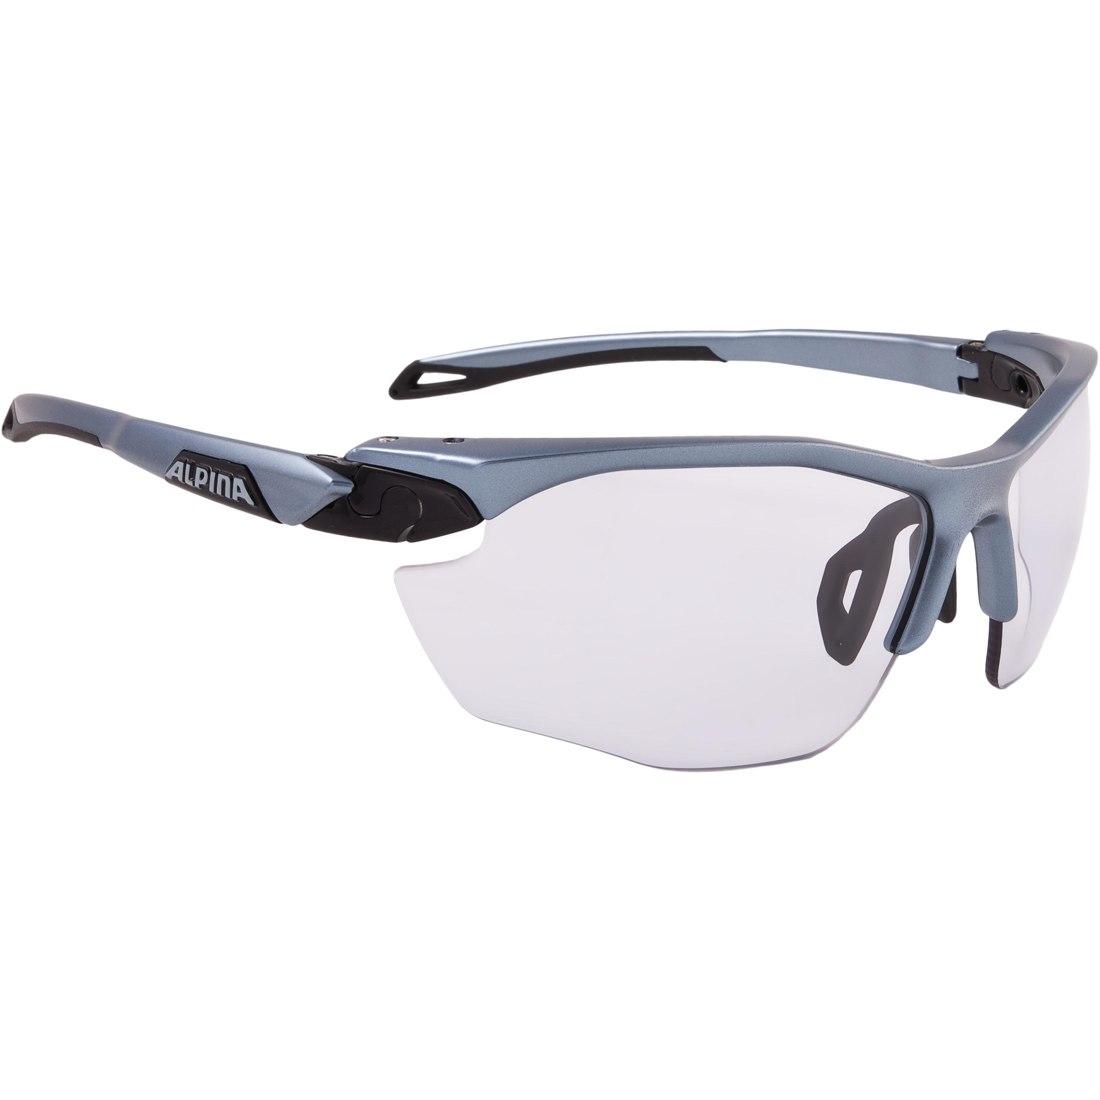 Alpina Twist Five HR VL+ tin-black/Varioflex black - Glasses